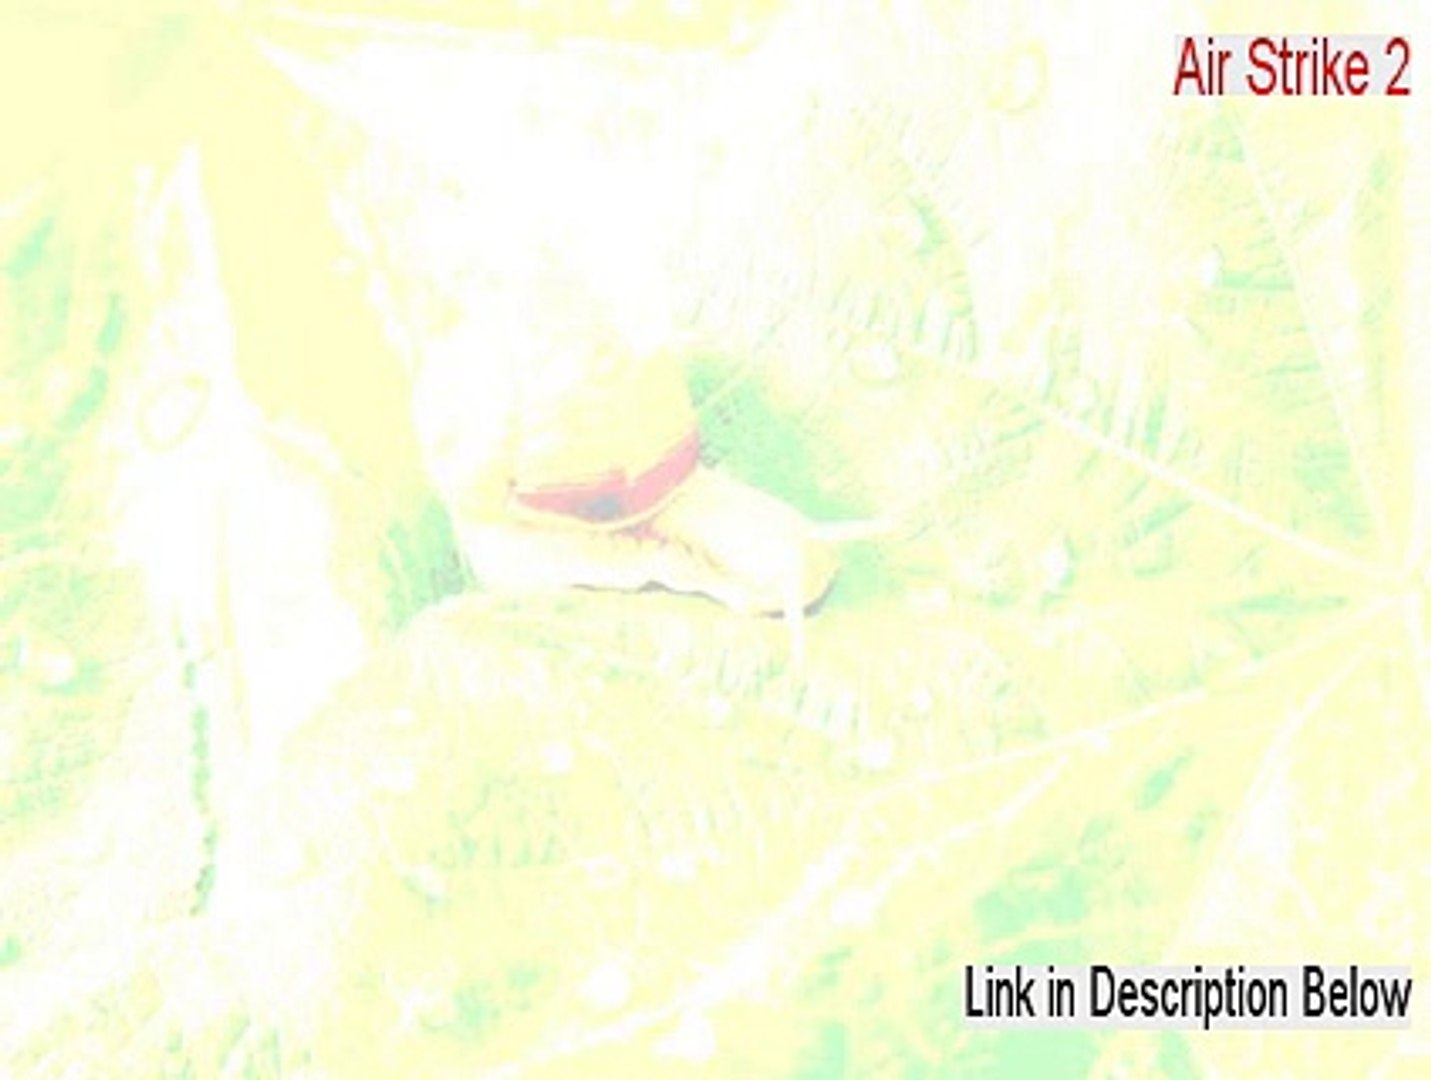 Air Strike 2 Download (air strike 2 2015)